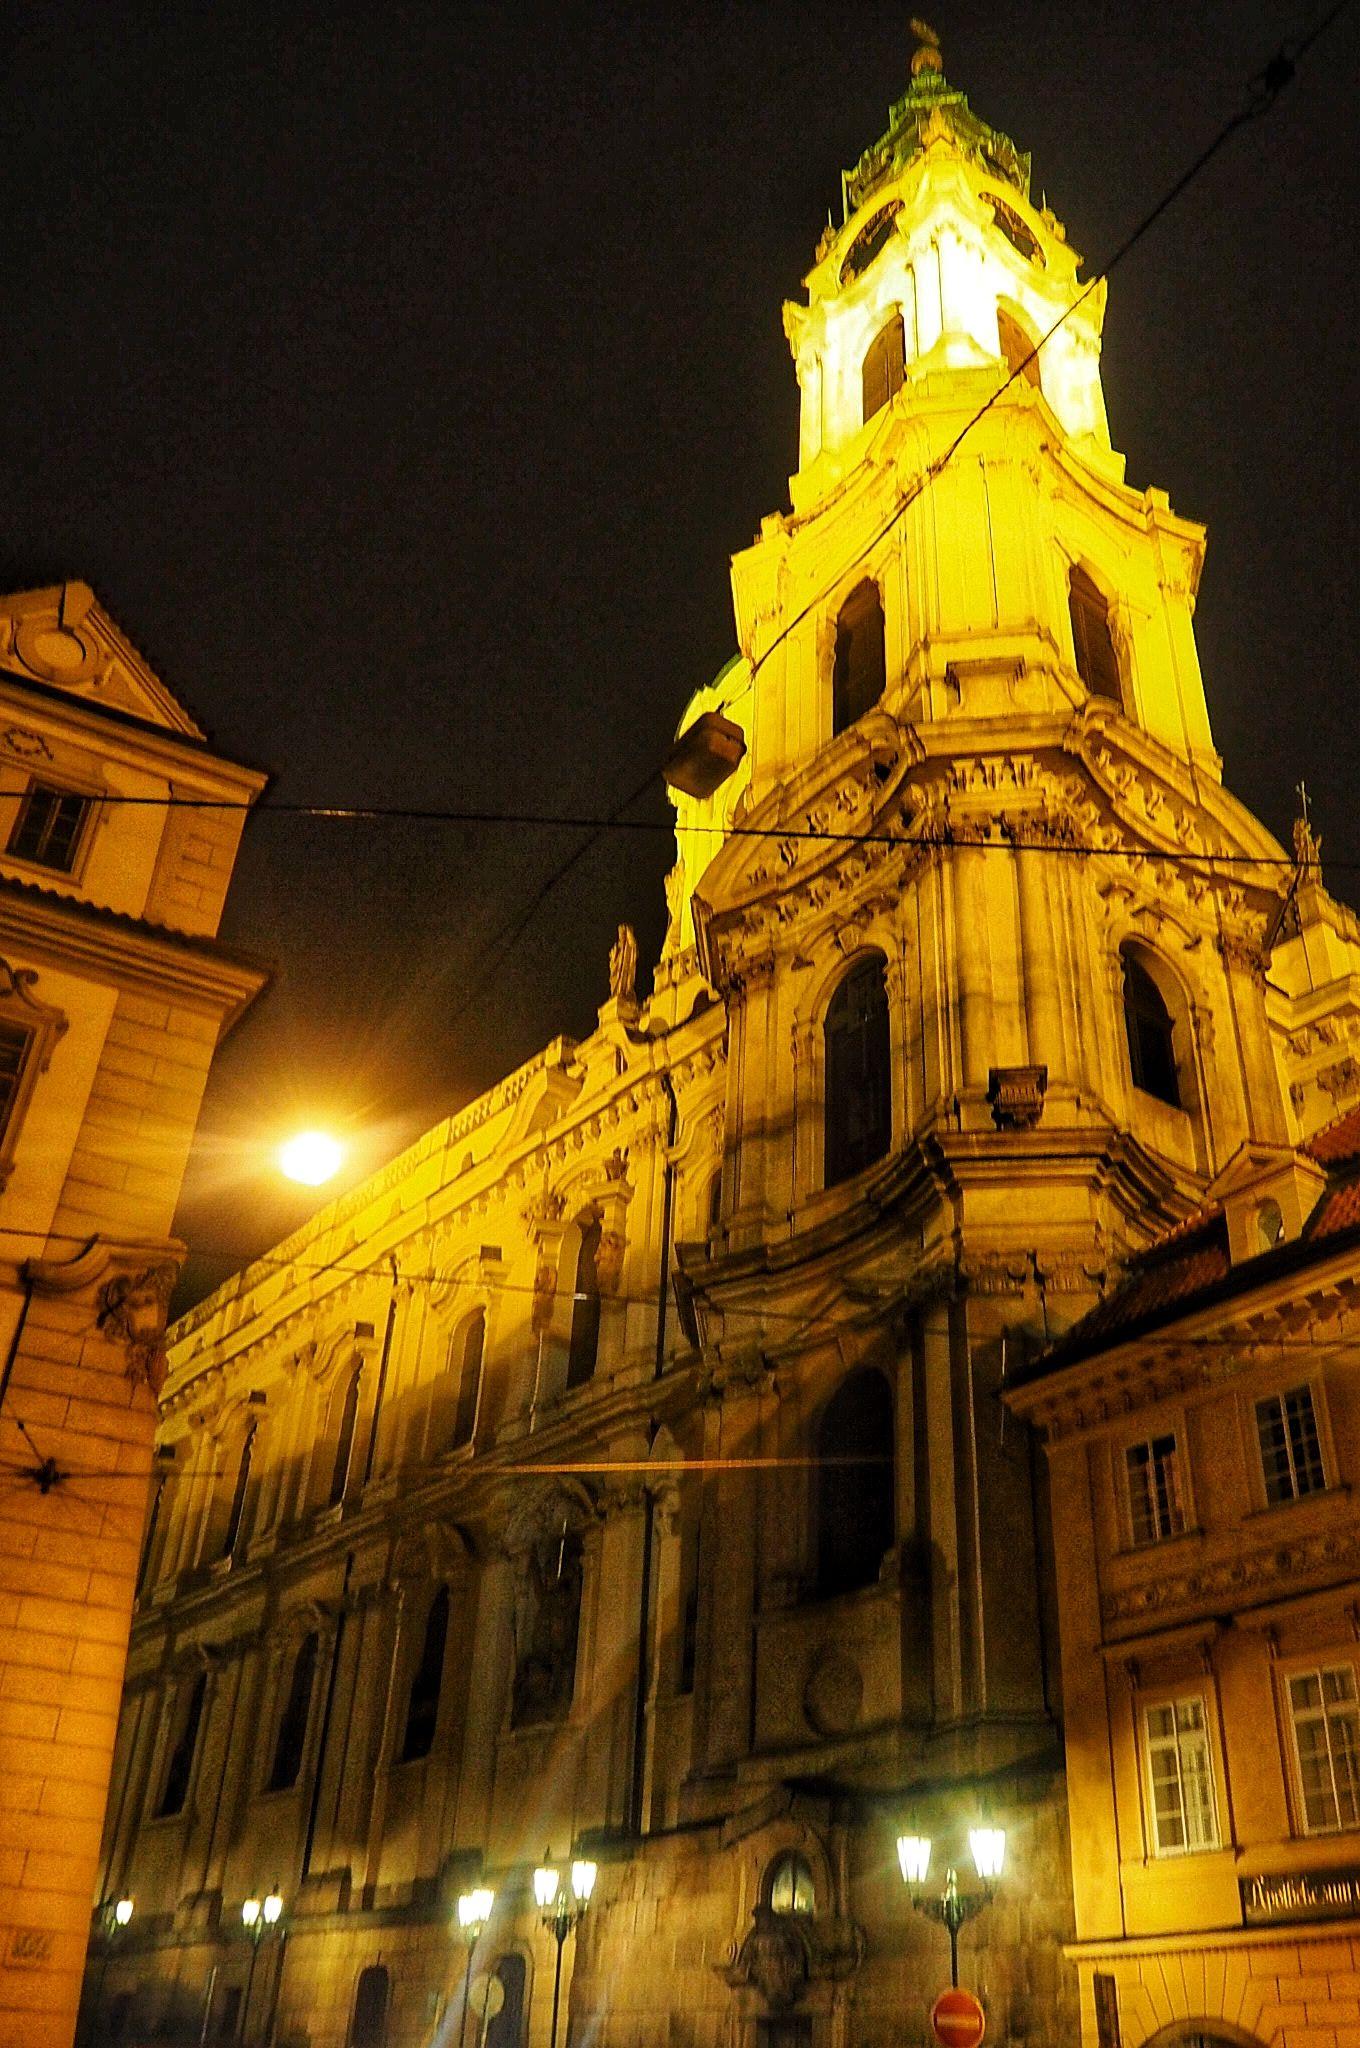 Architecture of Ostuni at Night